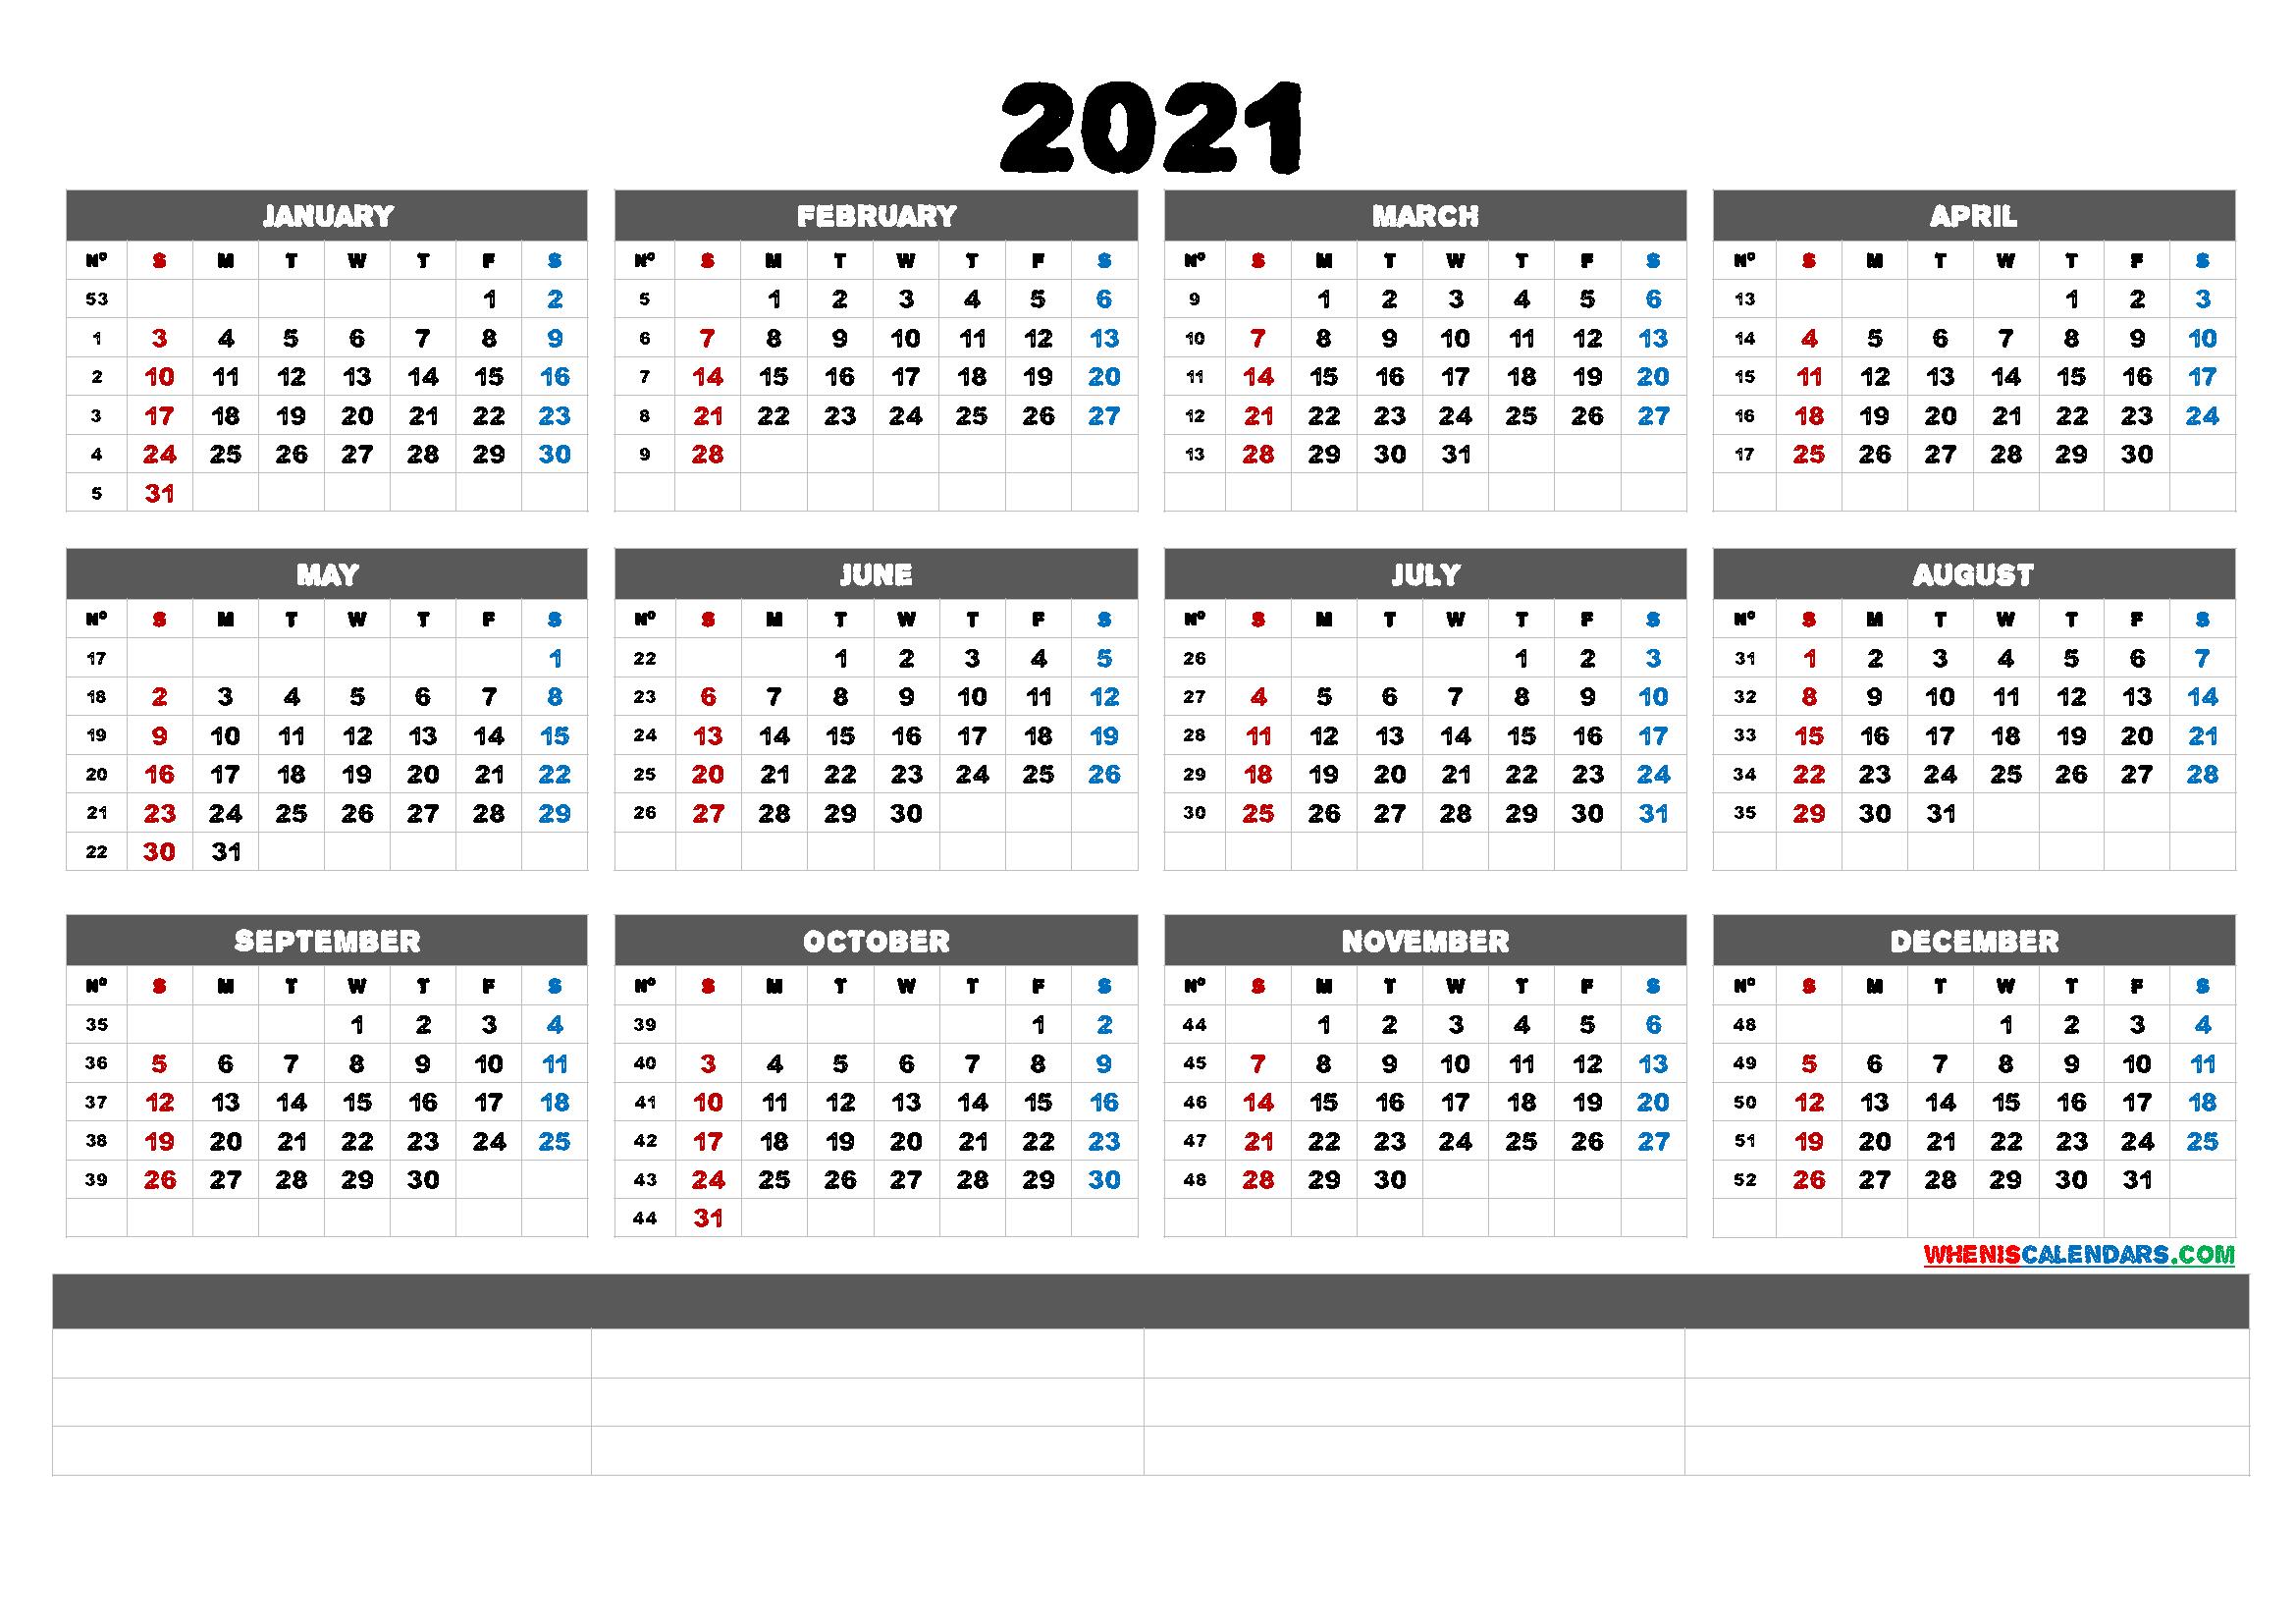 Free Printable 2021 Calendarmonth (6 Templates)